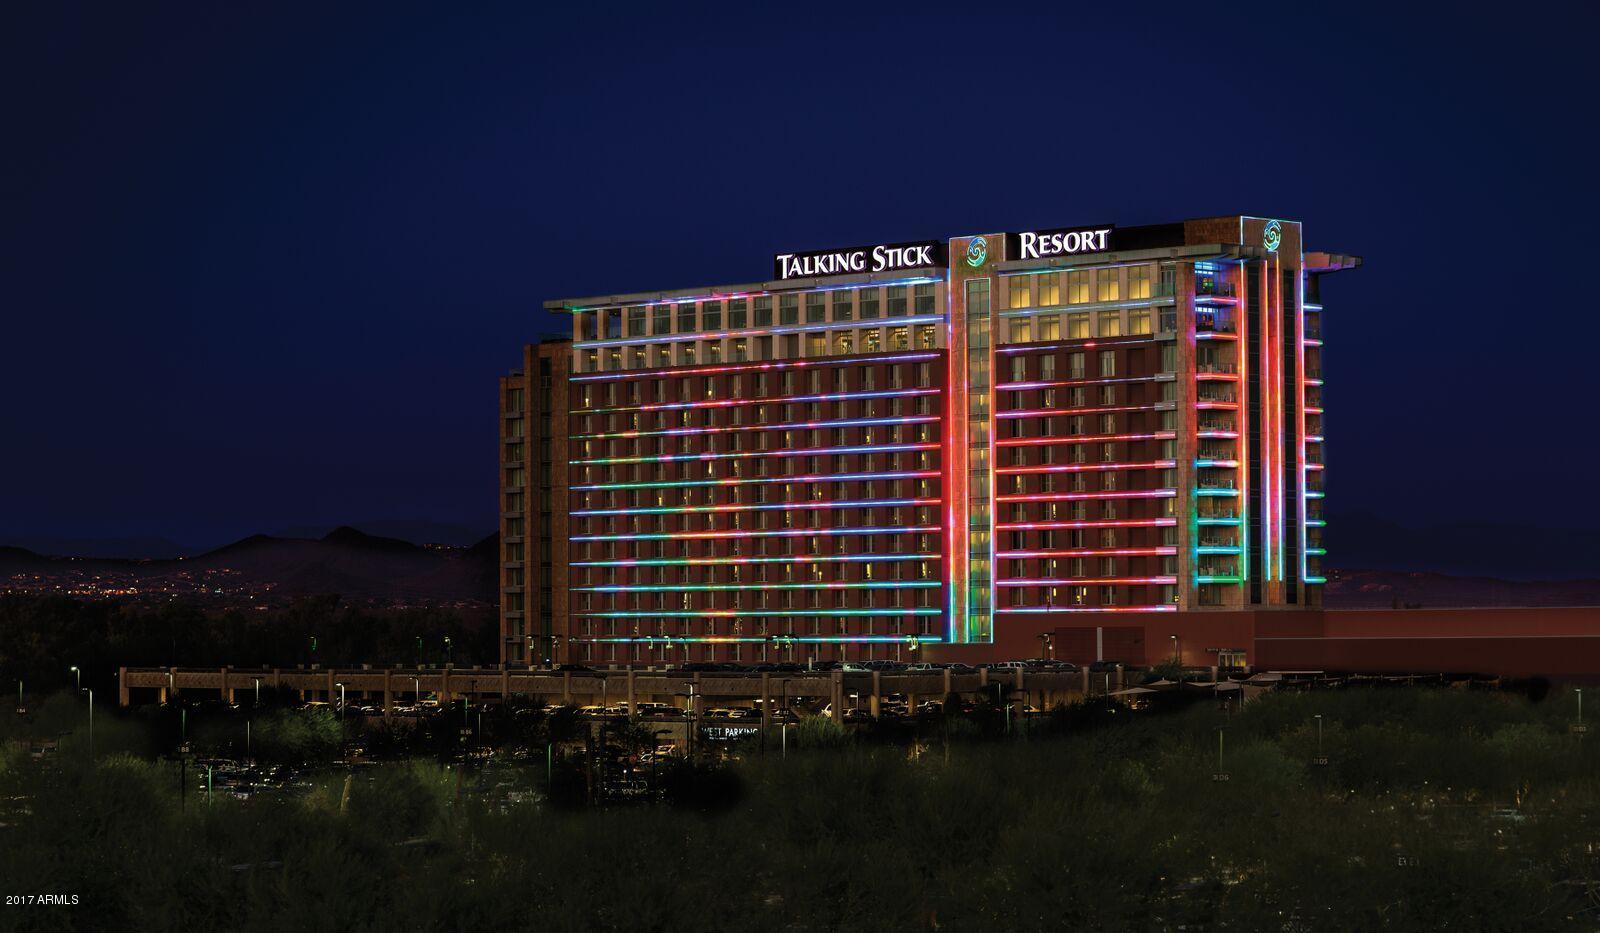 E VIA DE ENCANTO Scottsdale AZ Metro Phoenix Home Sales - Talking stick resort car show